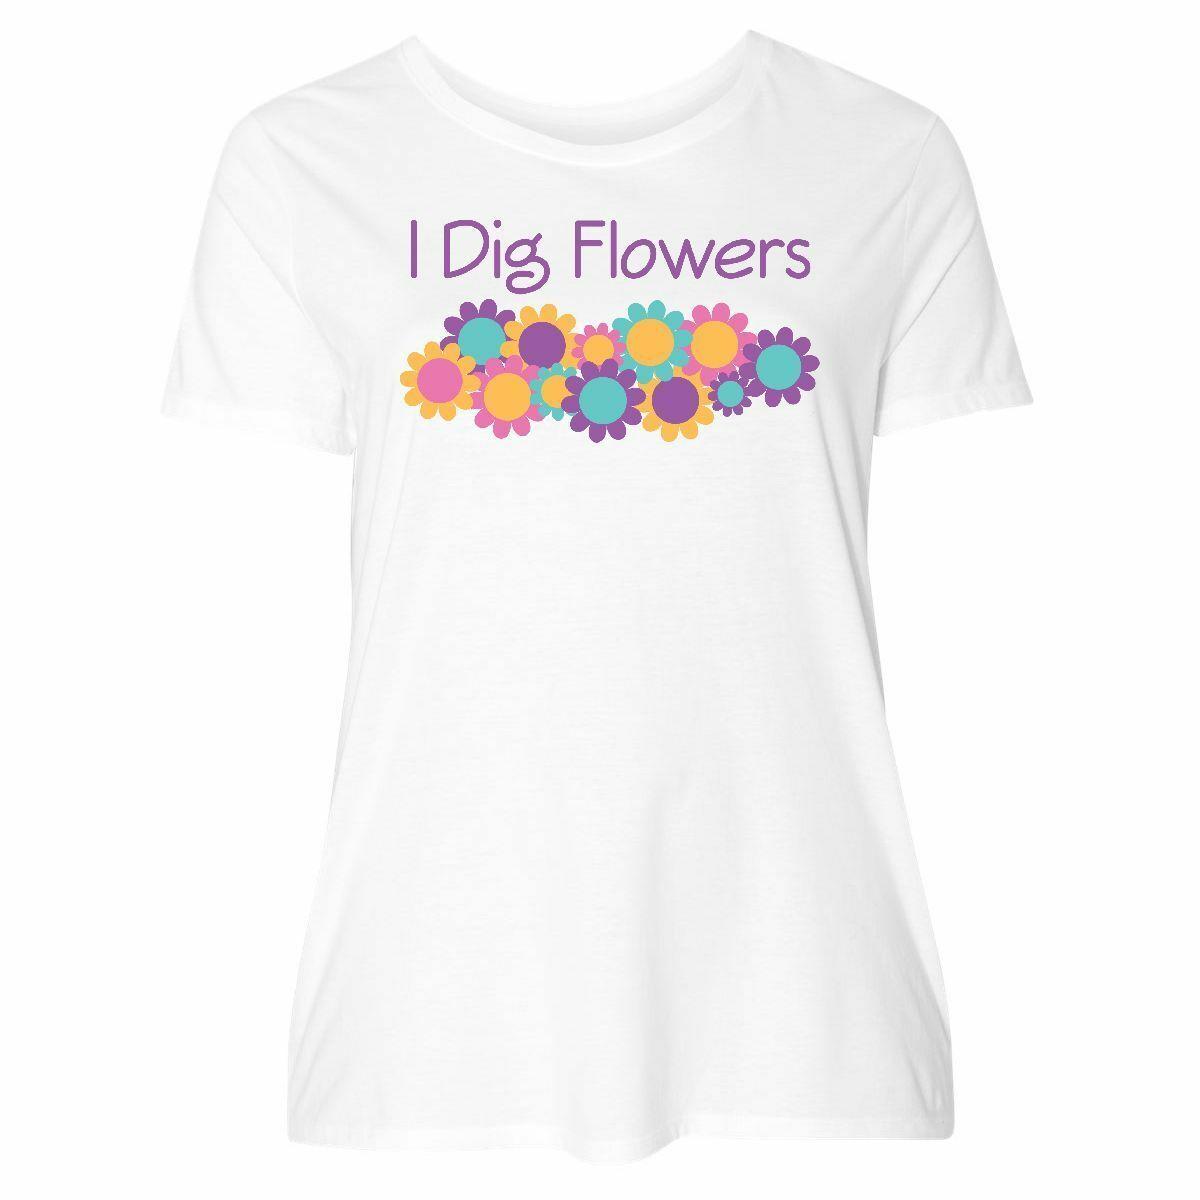 0fbd41074a Compre Inktastic Gardening Flower Gardener Gift Camiseta De Talla Grande  Para Mujer Daisy Garden Funny 100% Algodón Camiseta Fear Cosplay Liverpoott  ...